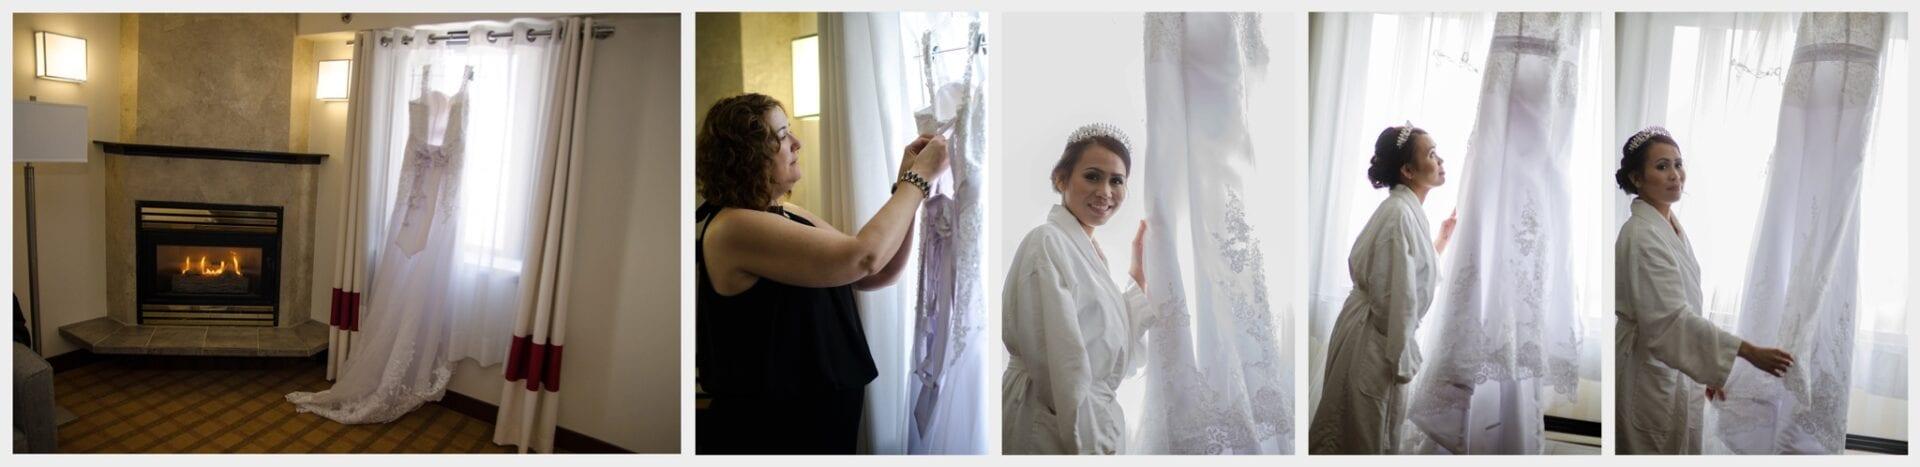 Four Points by Sheraton Edmonton South Wedding Photography Photographer Ceremony Venue-_0103